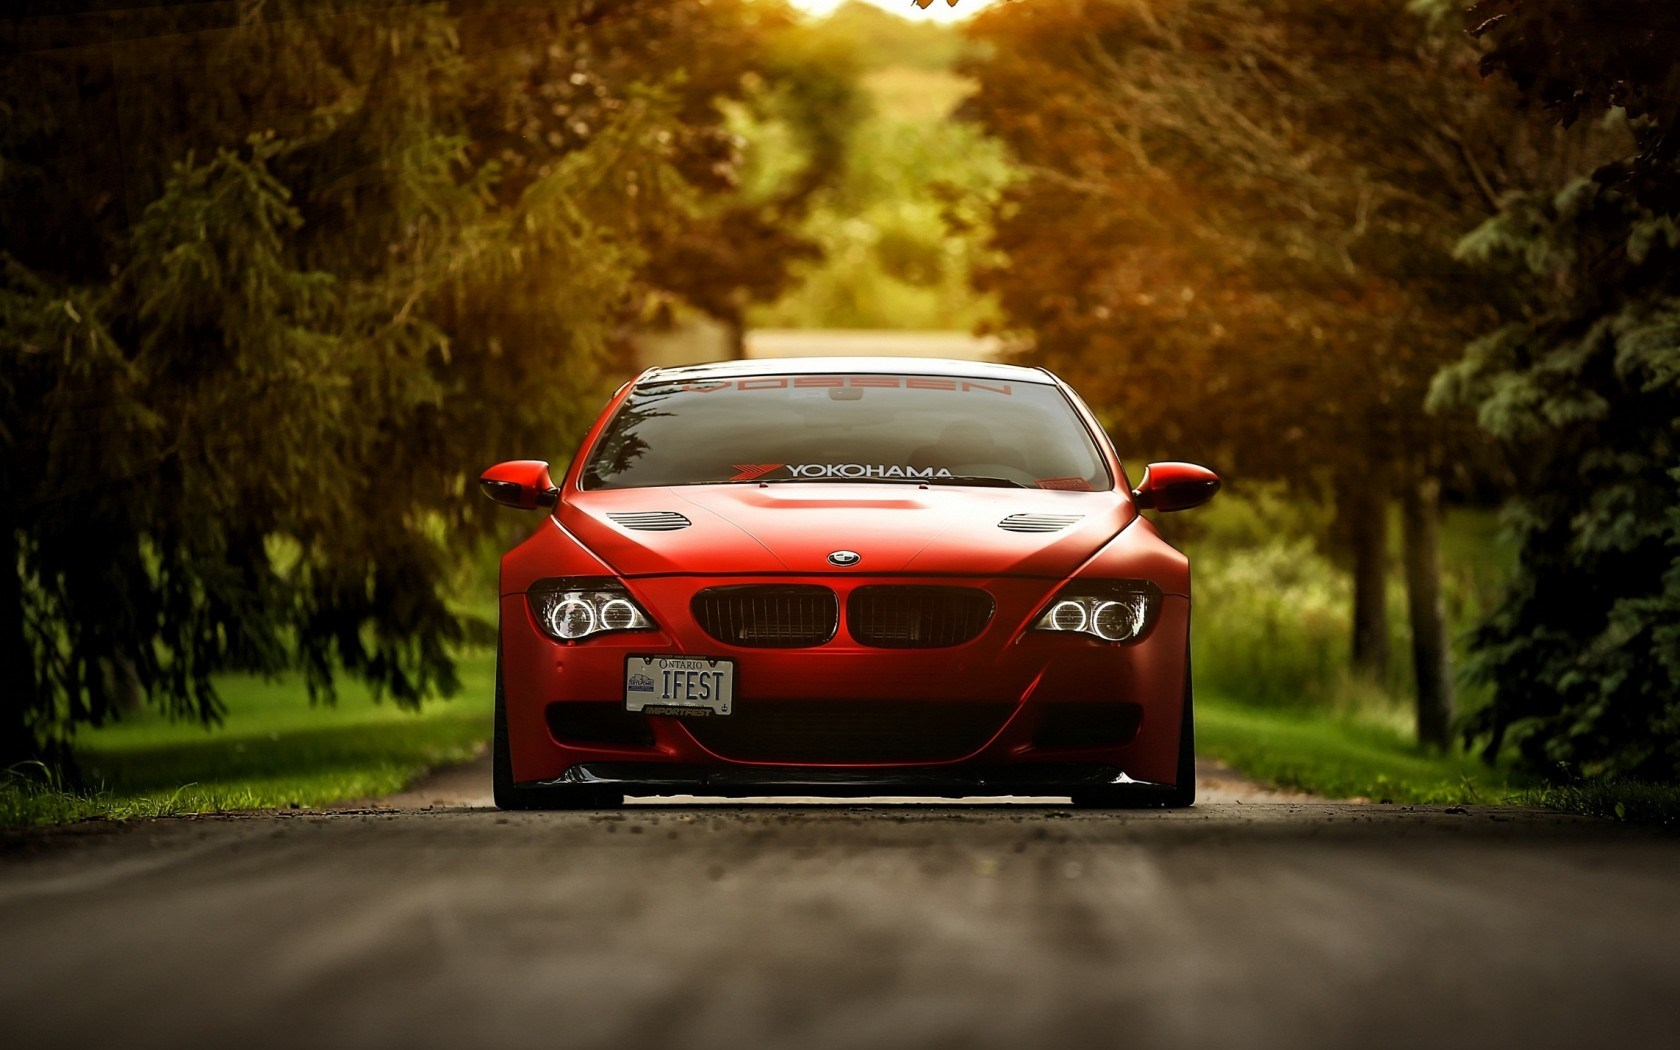 BMW M6 E63 Red Car HD Wallpaper